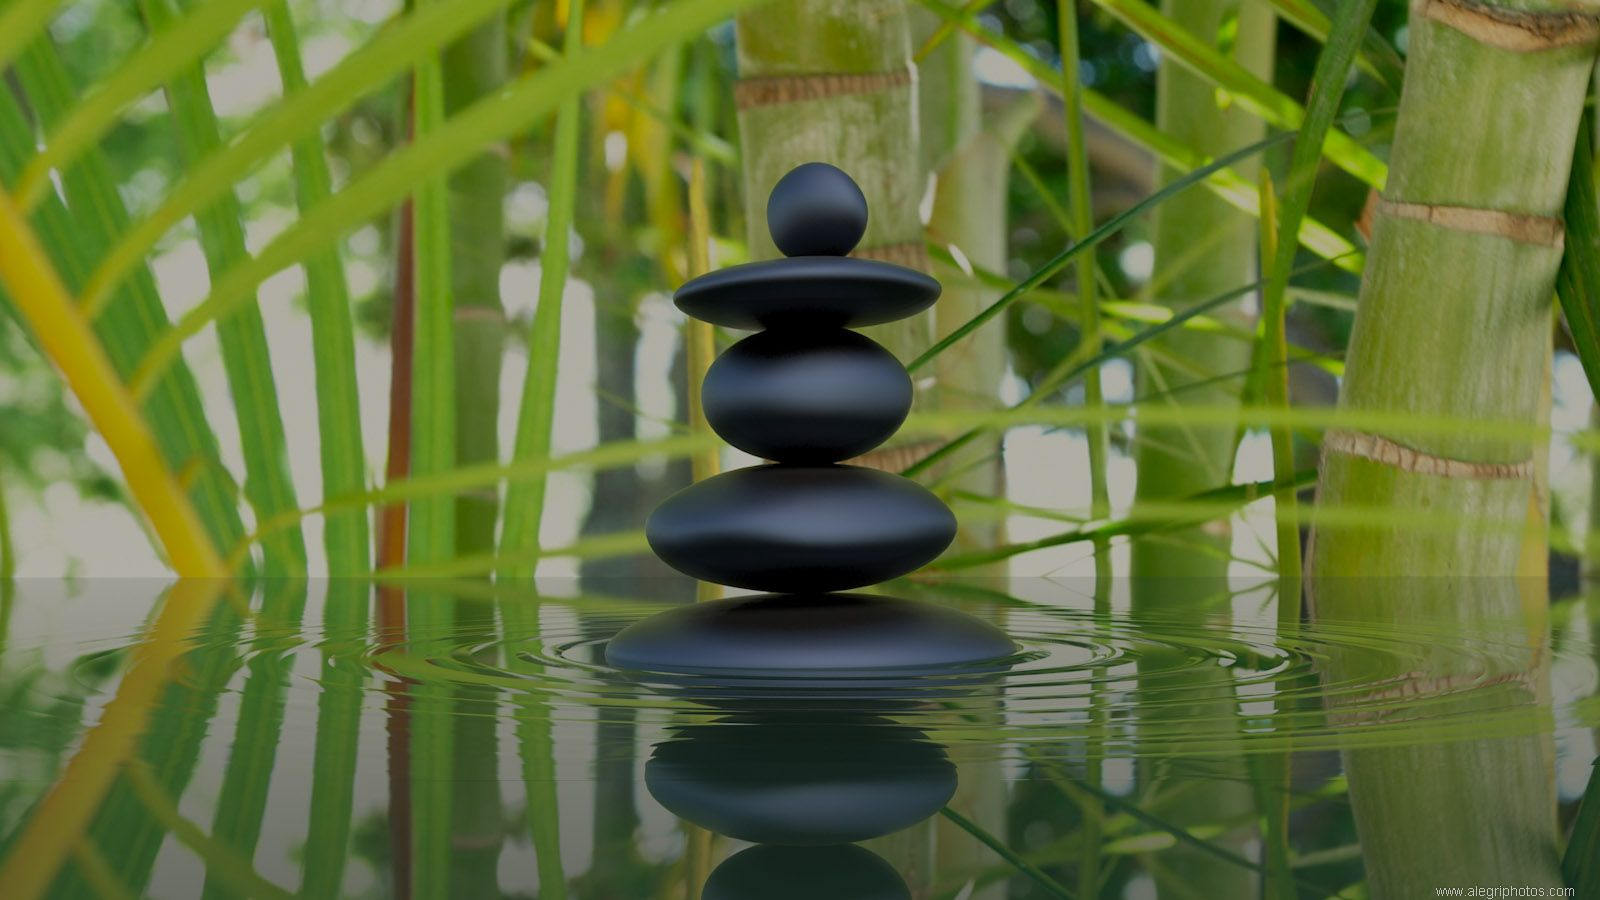 Hd wallpaper zen - Bamboo And Zen Stones Wallpaper Wallpaper Wide Hd